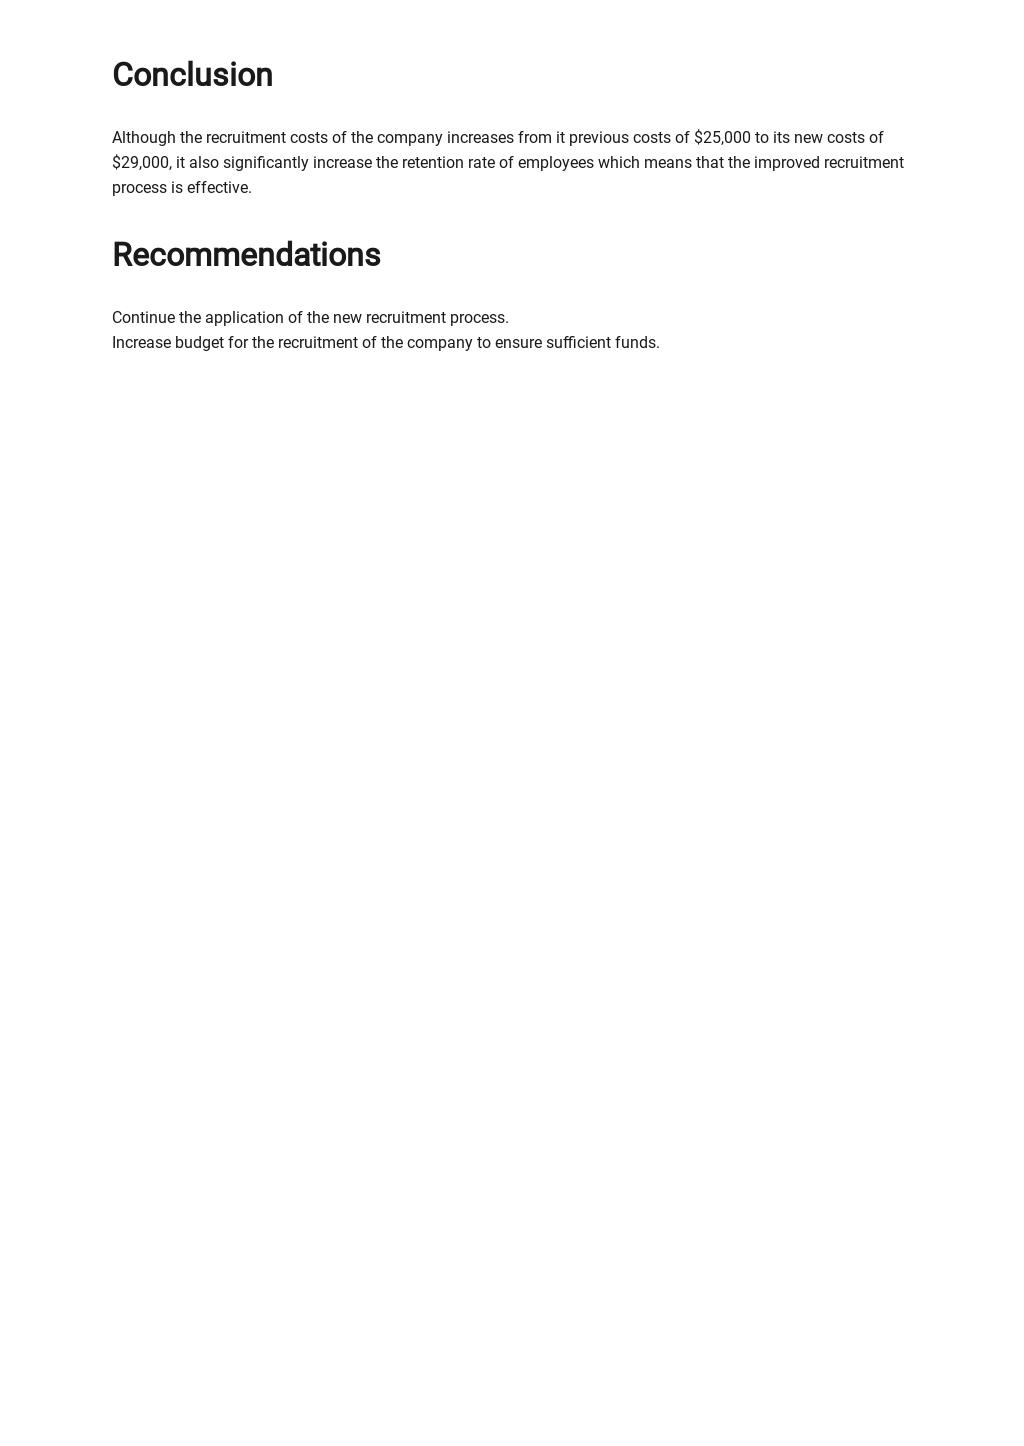 Free HR Analysis Report Template 4.jpe